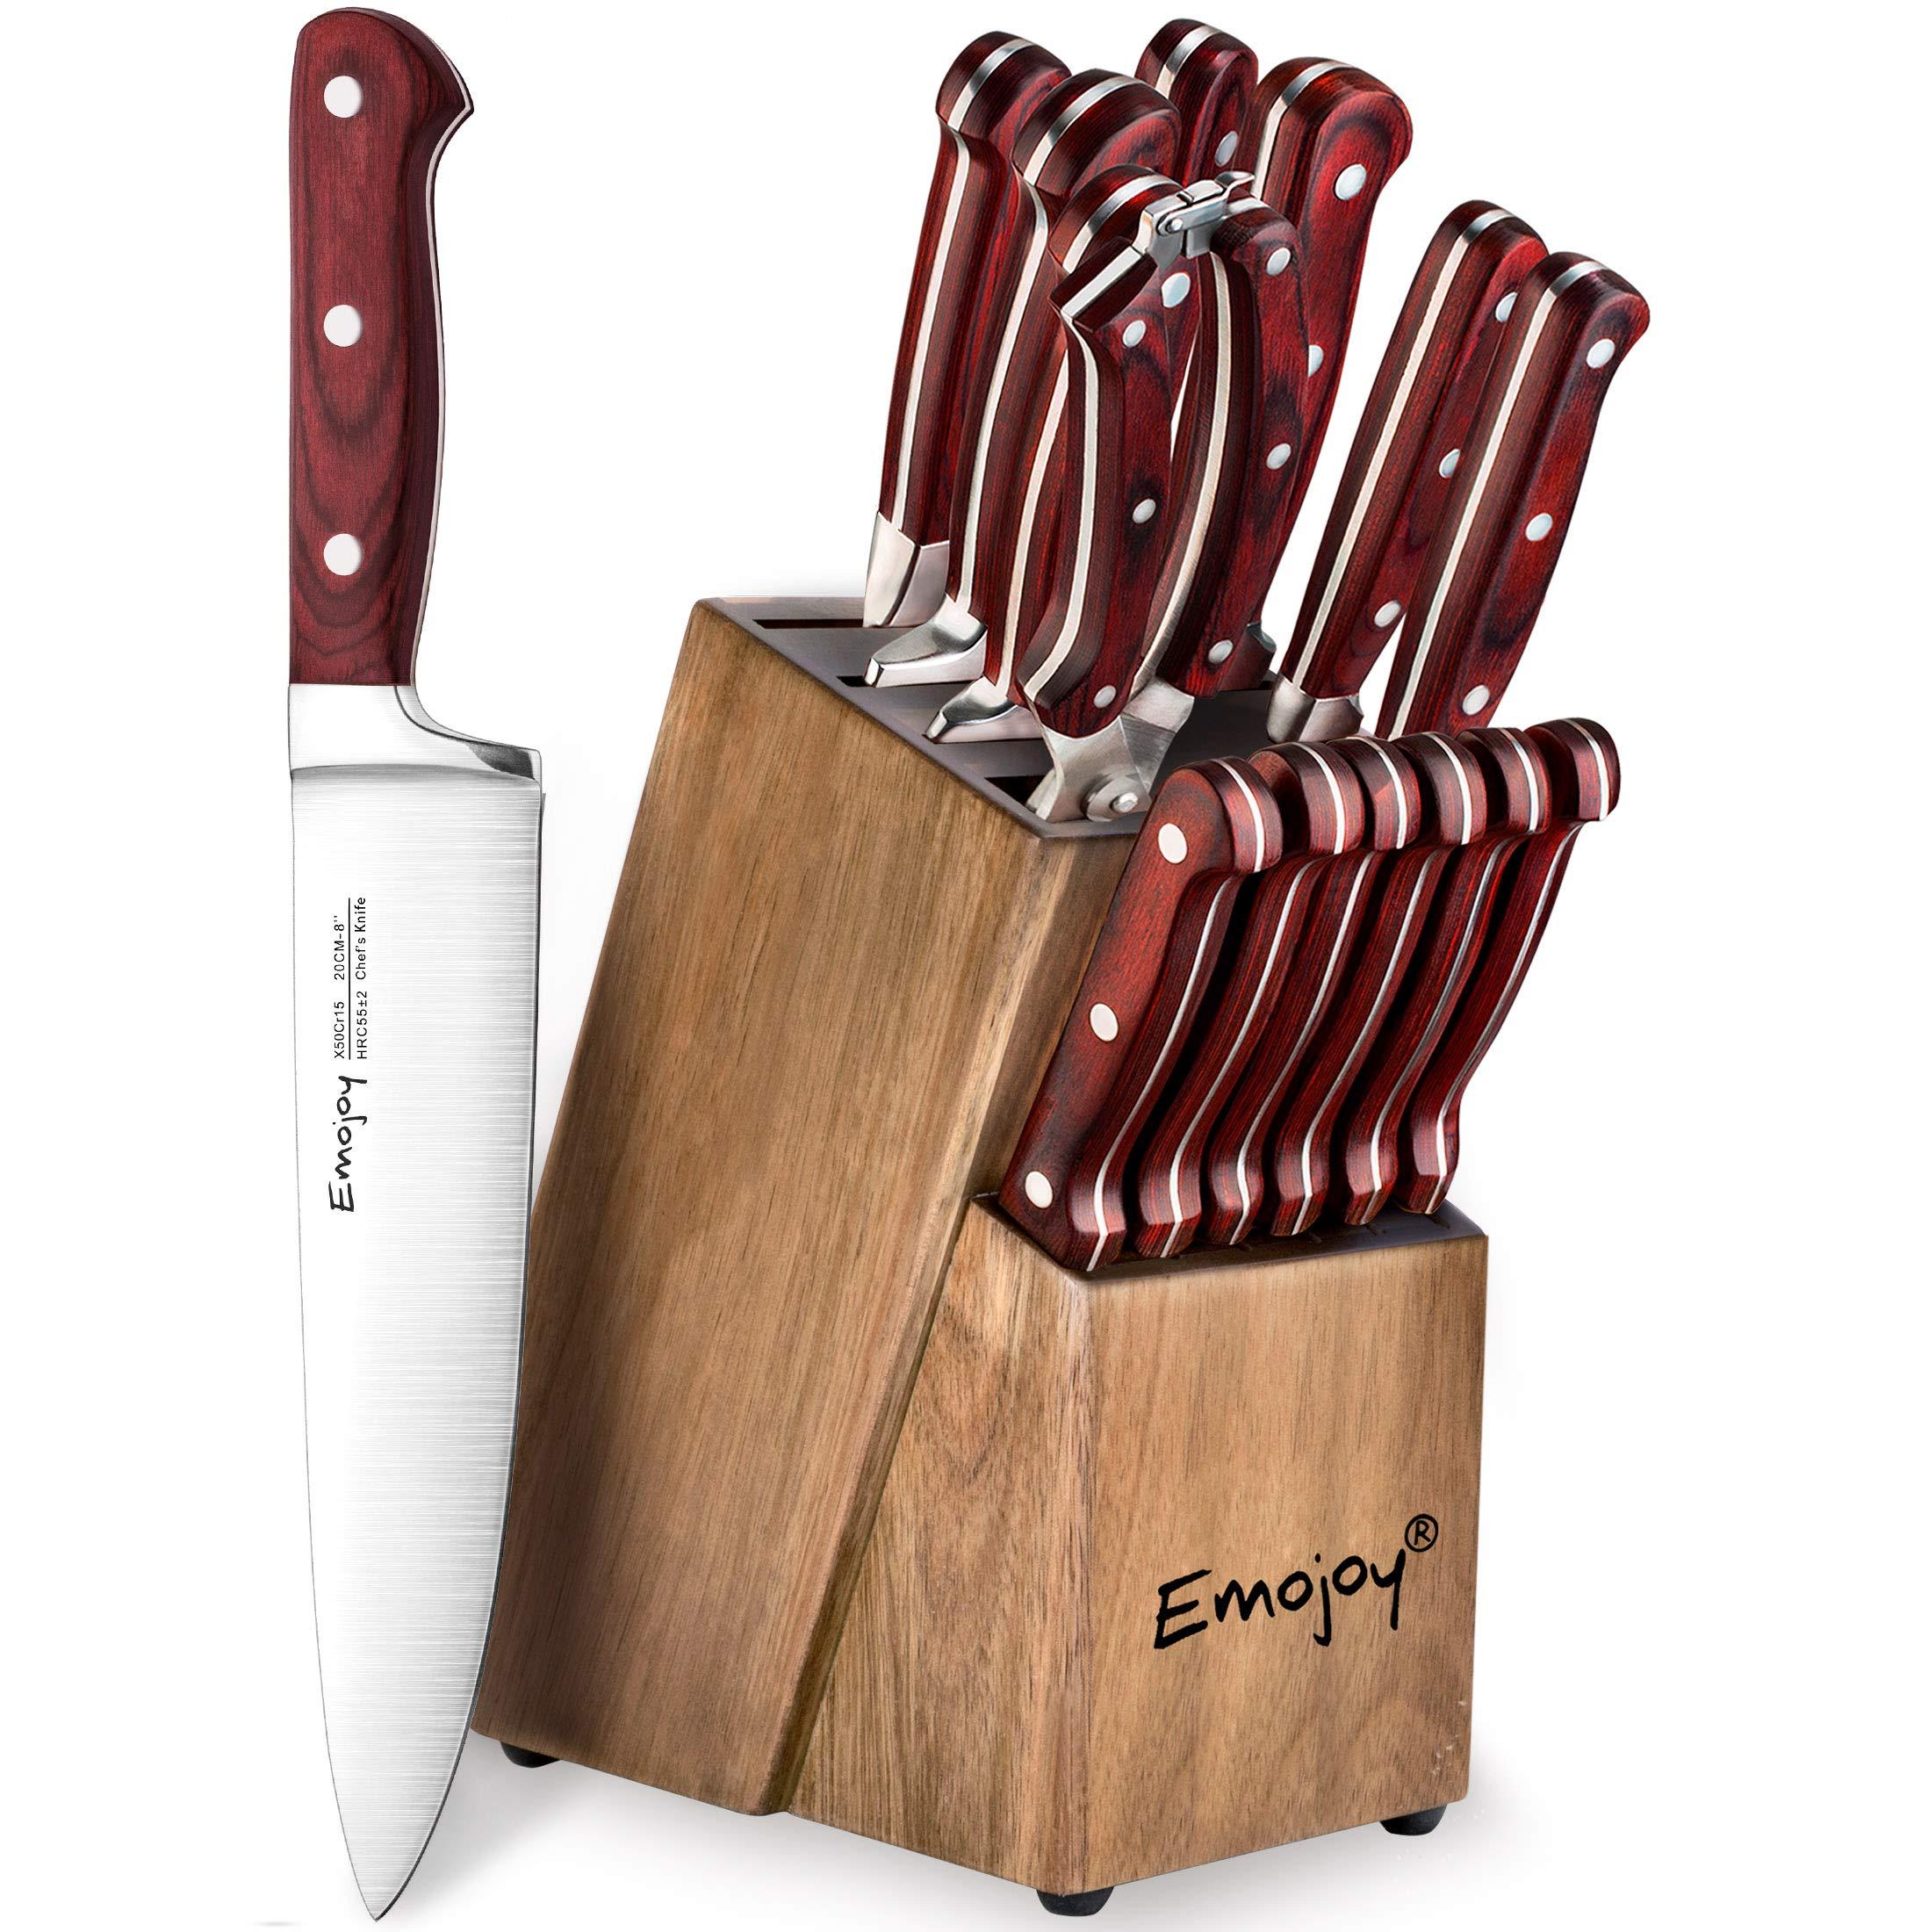 Knife Set, 15-Piece Kitchen Knife Set with Wattle-Wood Block, Manual Sharpening for Chef Knife Set, German Stainless Steel, Emojoy